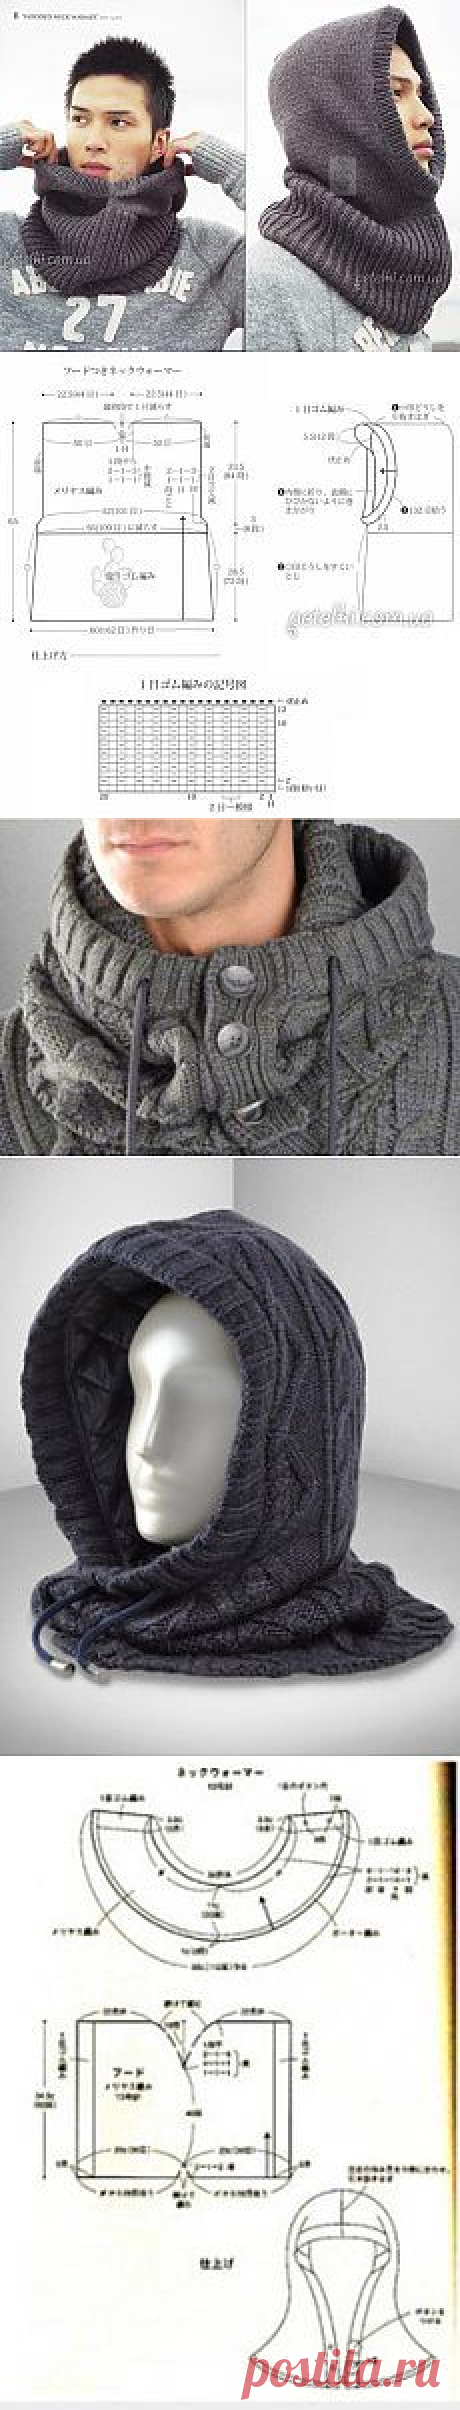 (13) Вязаный мужской снуд / шапка-капюшон спицами. | вязание. шапки,береты,шарфы